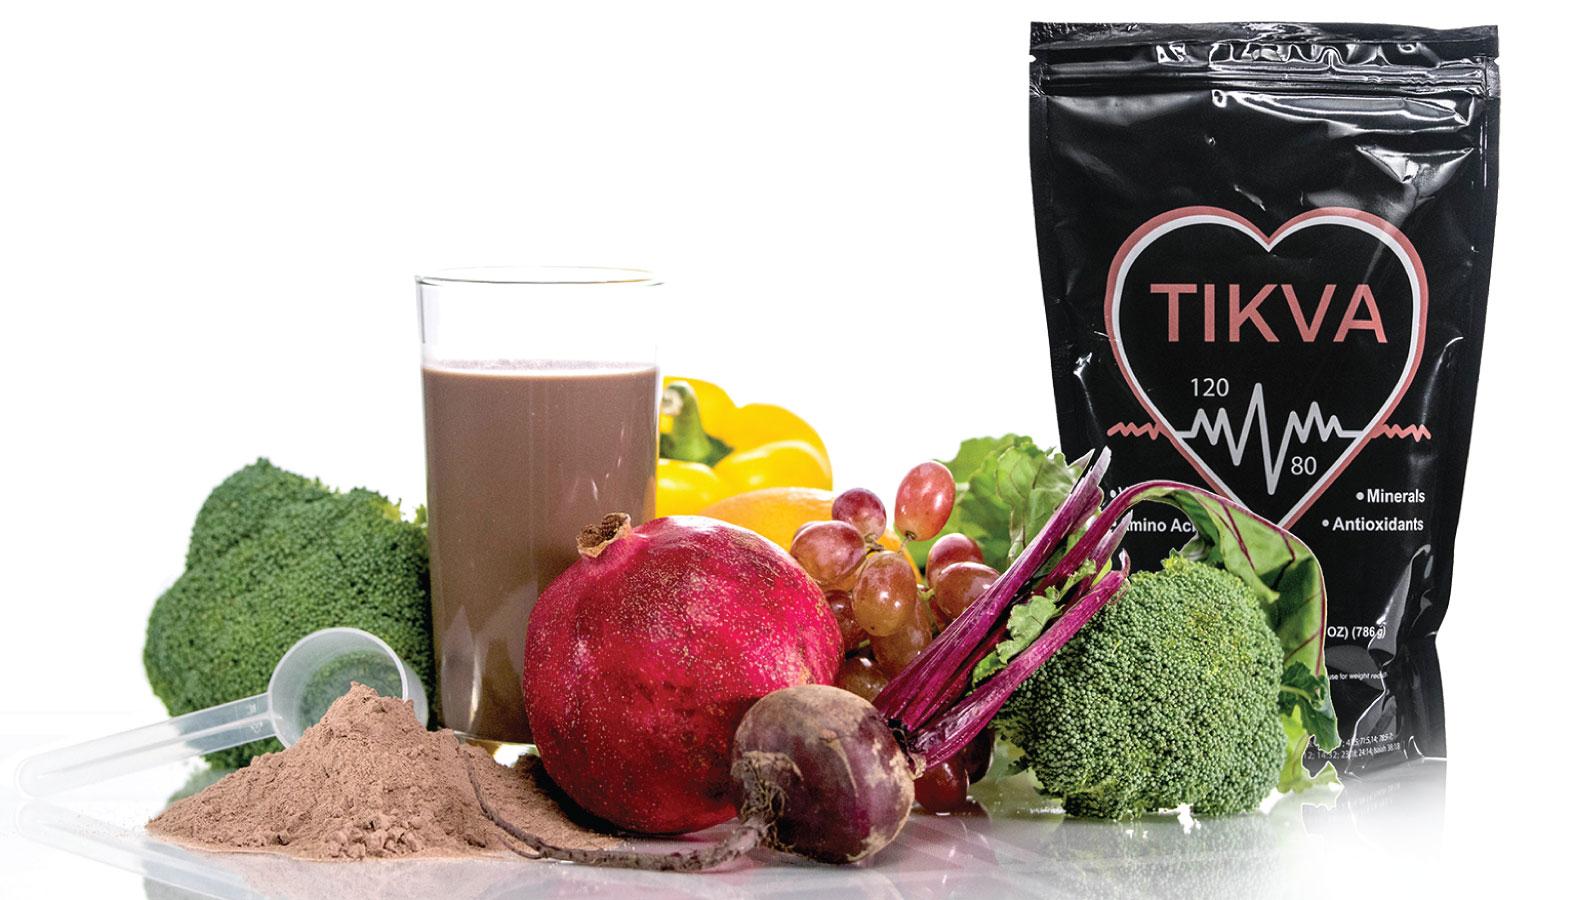 Tikva- Lower Your Blood Pressure